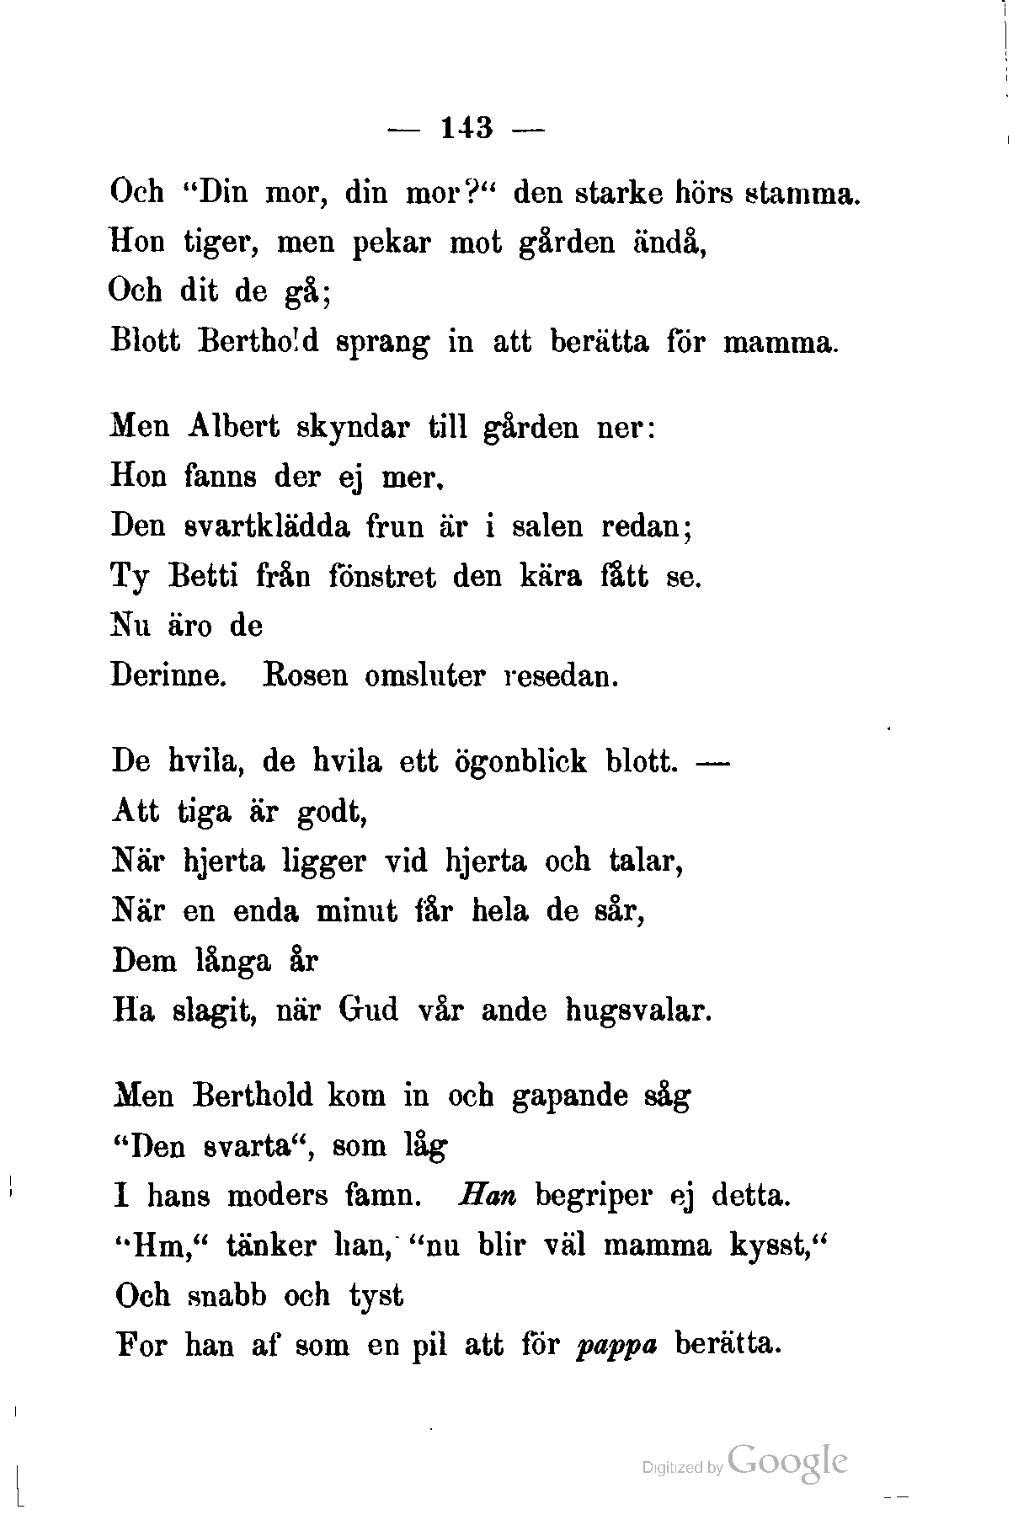 dikt om mamma